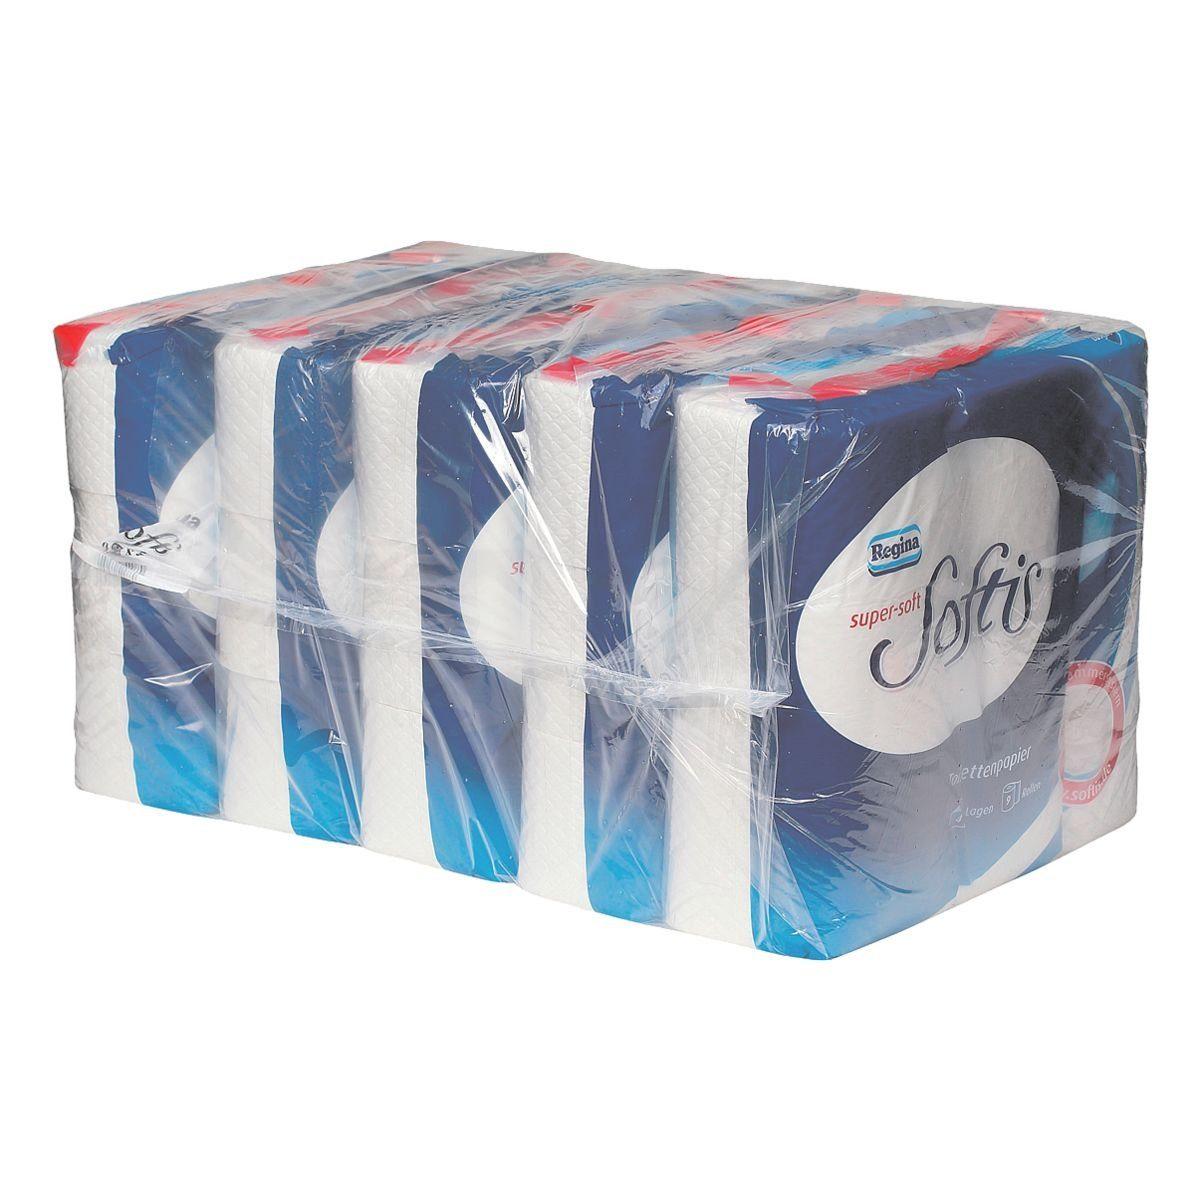 REGINA Toilettenpapier 4-lagig - 45 Rollen »Softis«